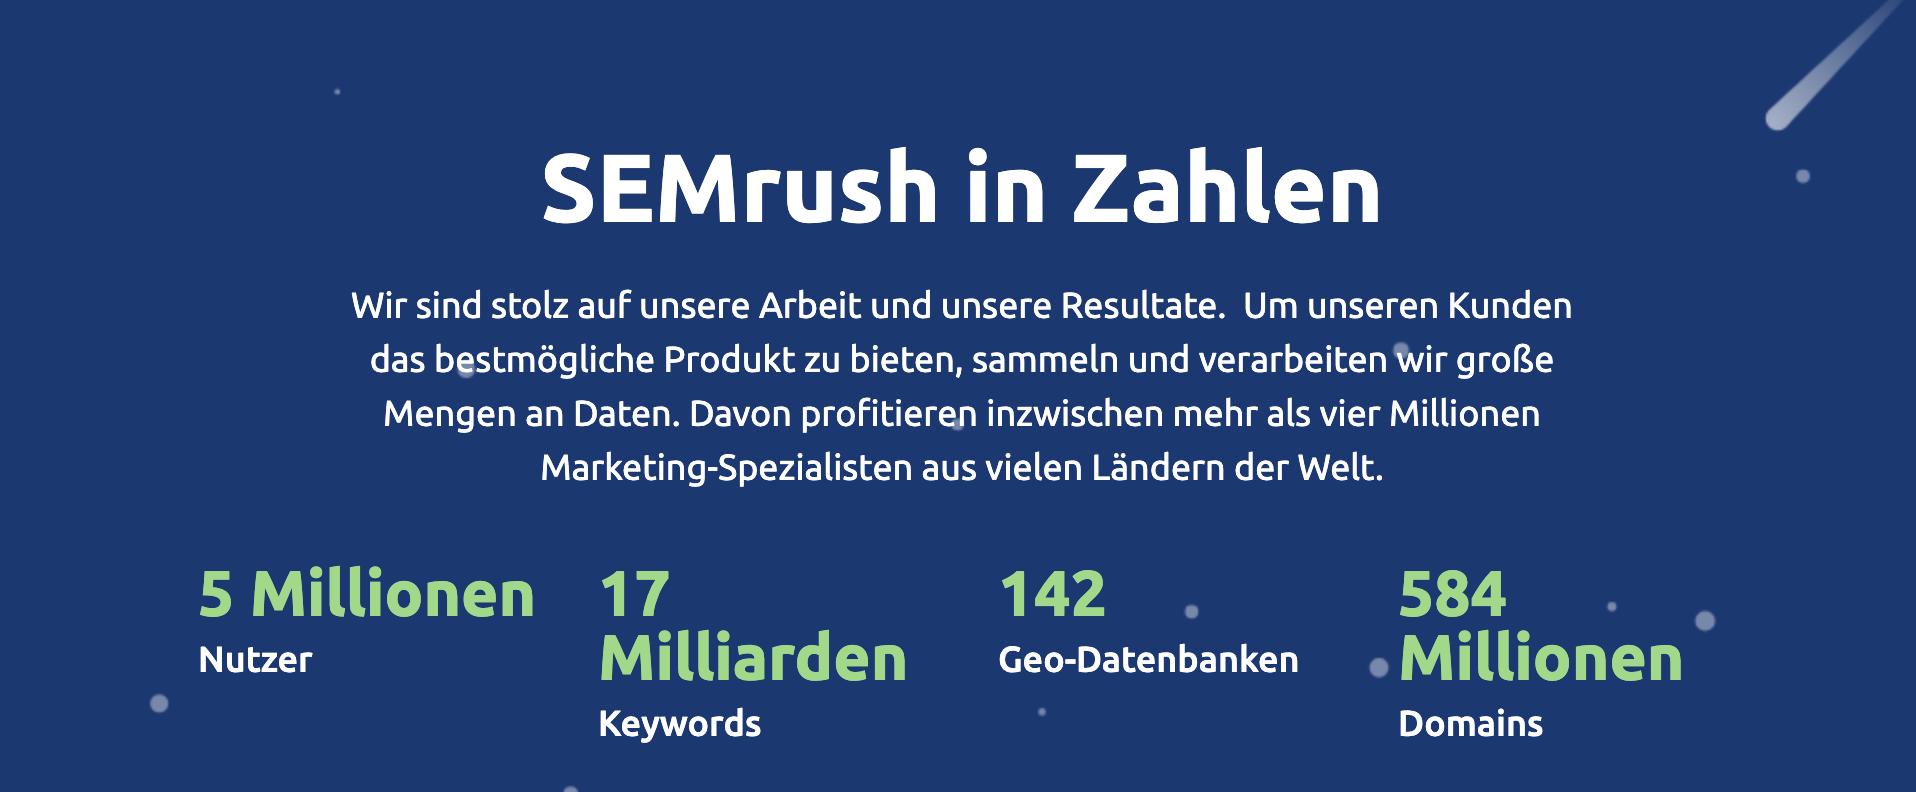 SEMrush in Zahlen